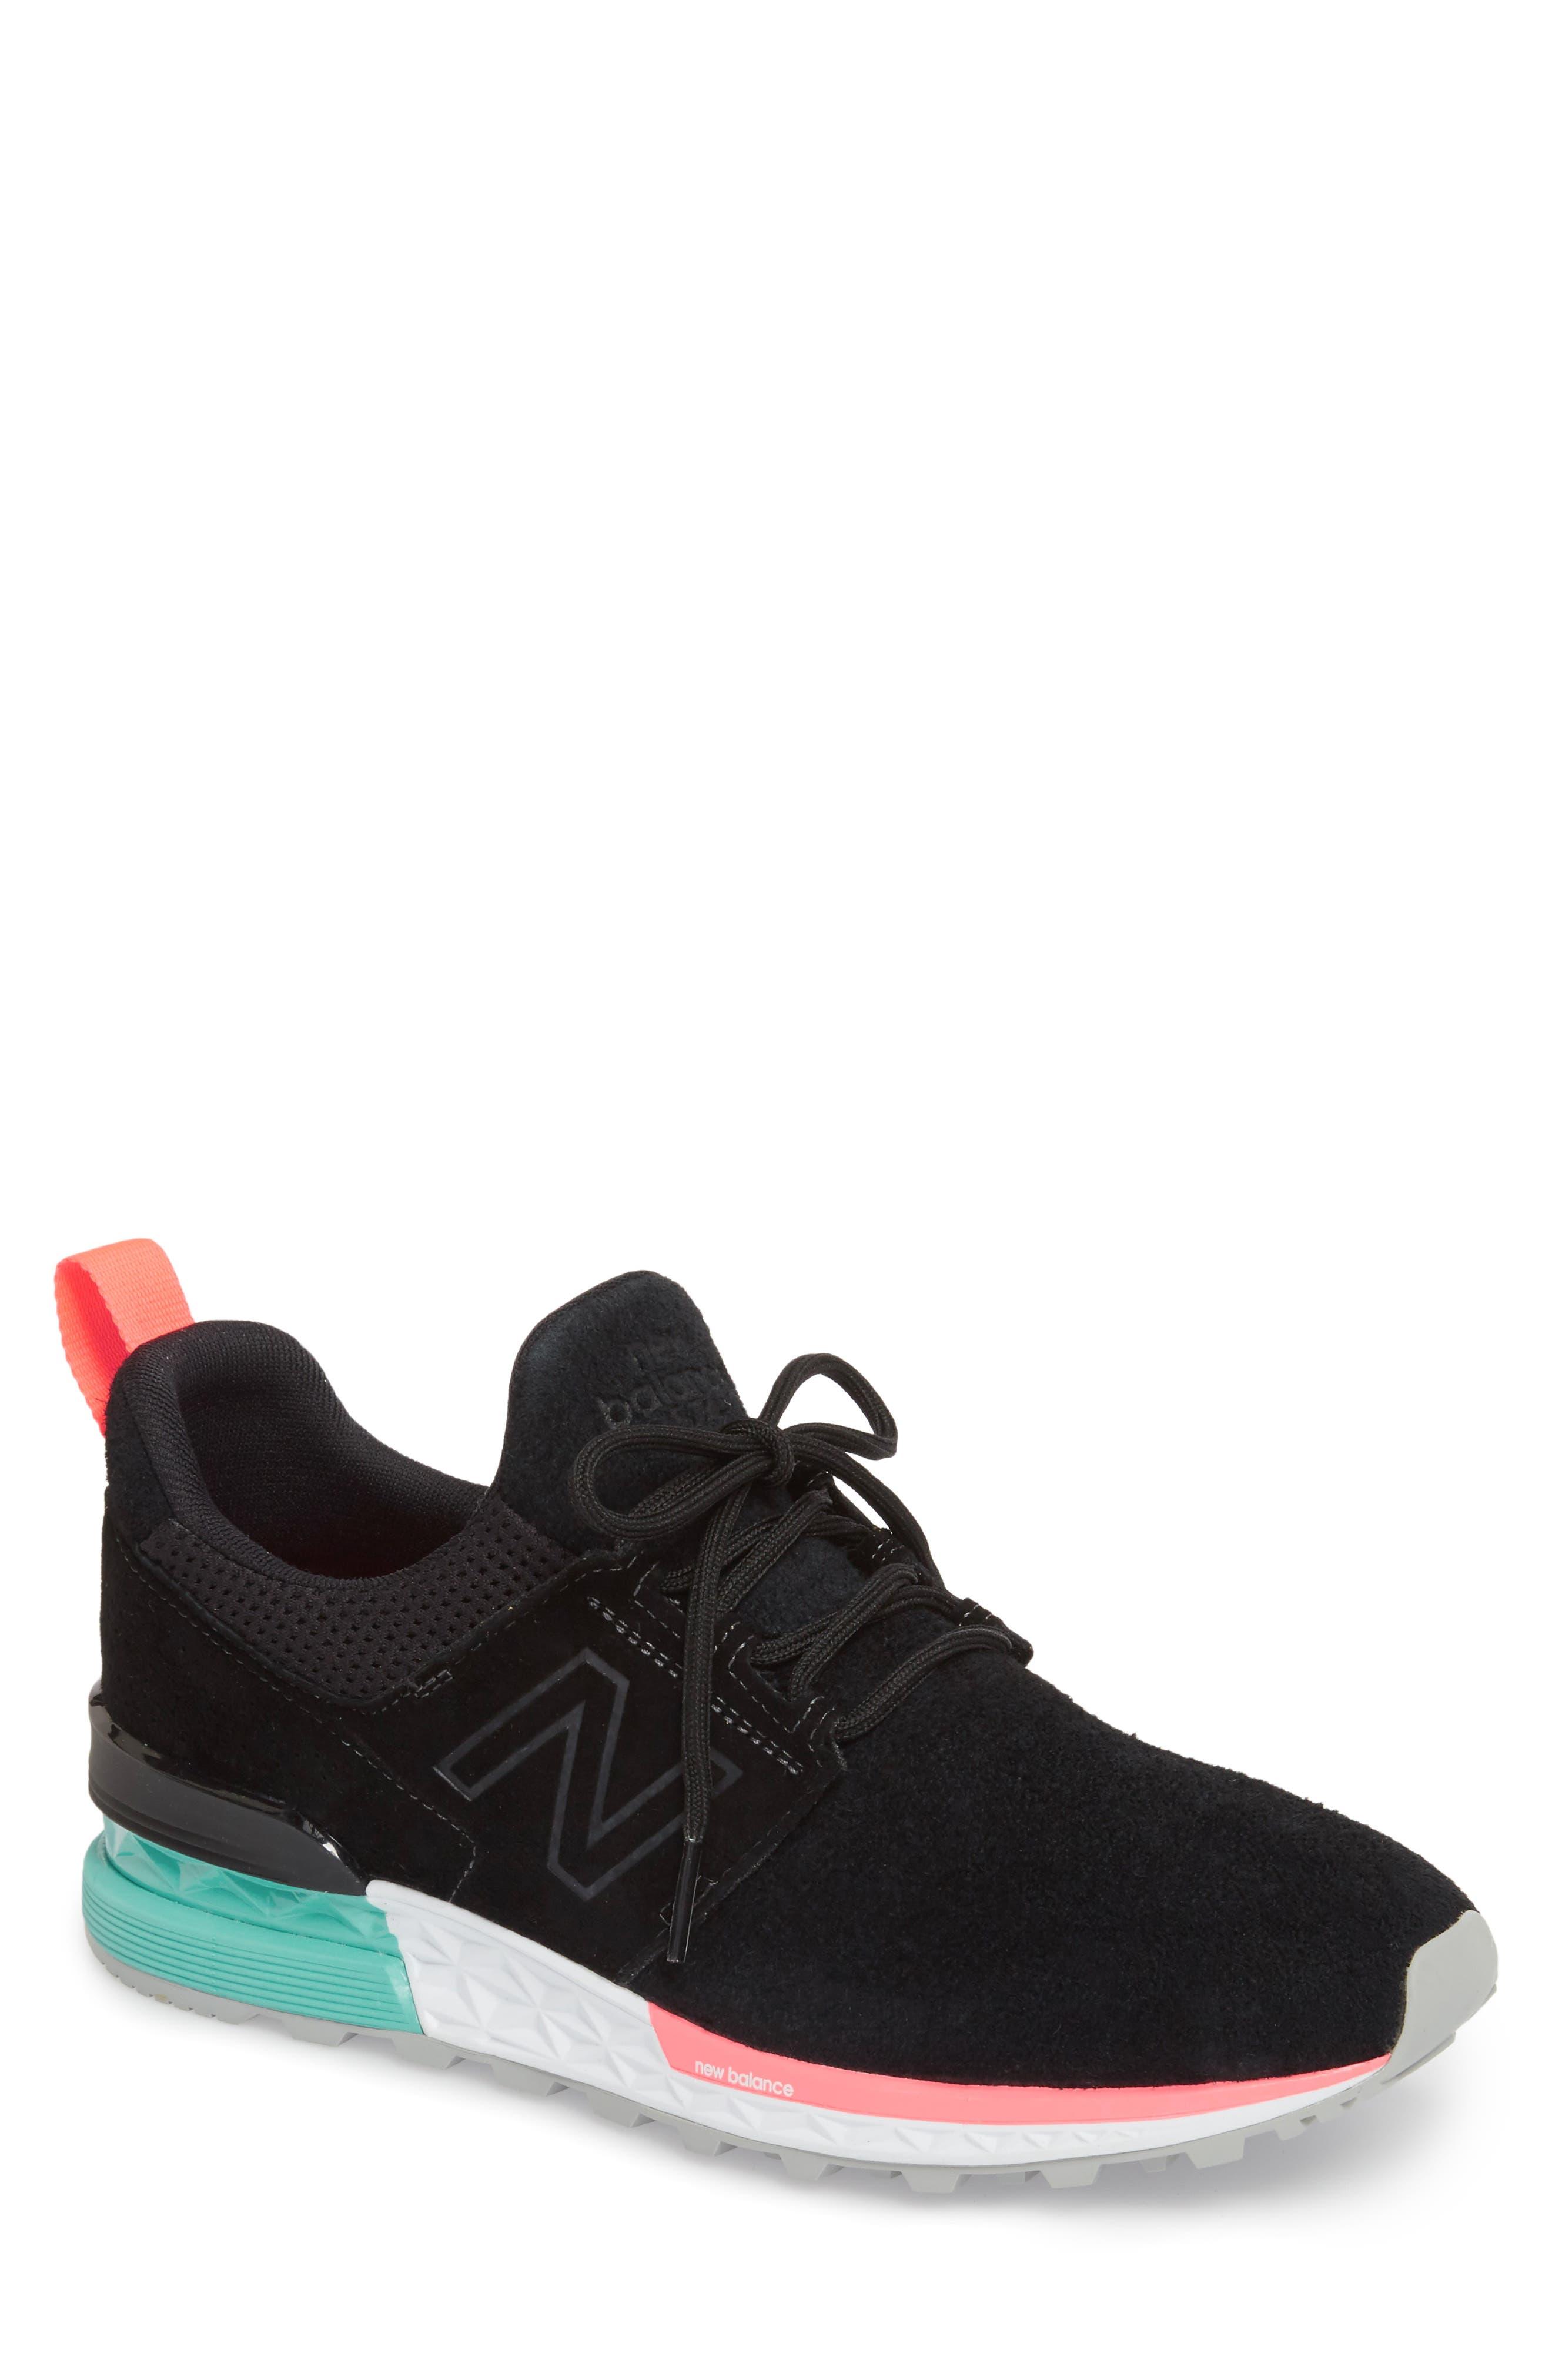 574 Sport Sneaker,                             Main thumbnail 1, color,